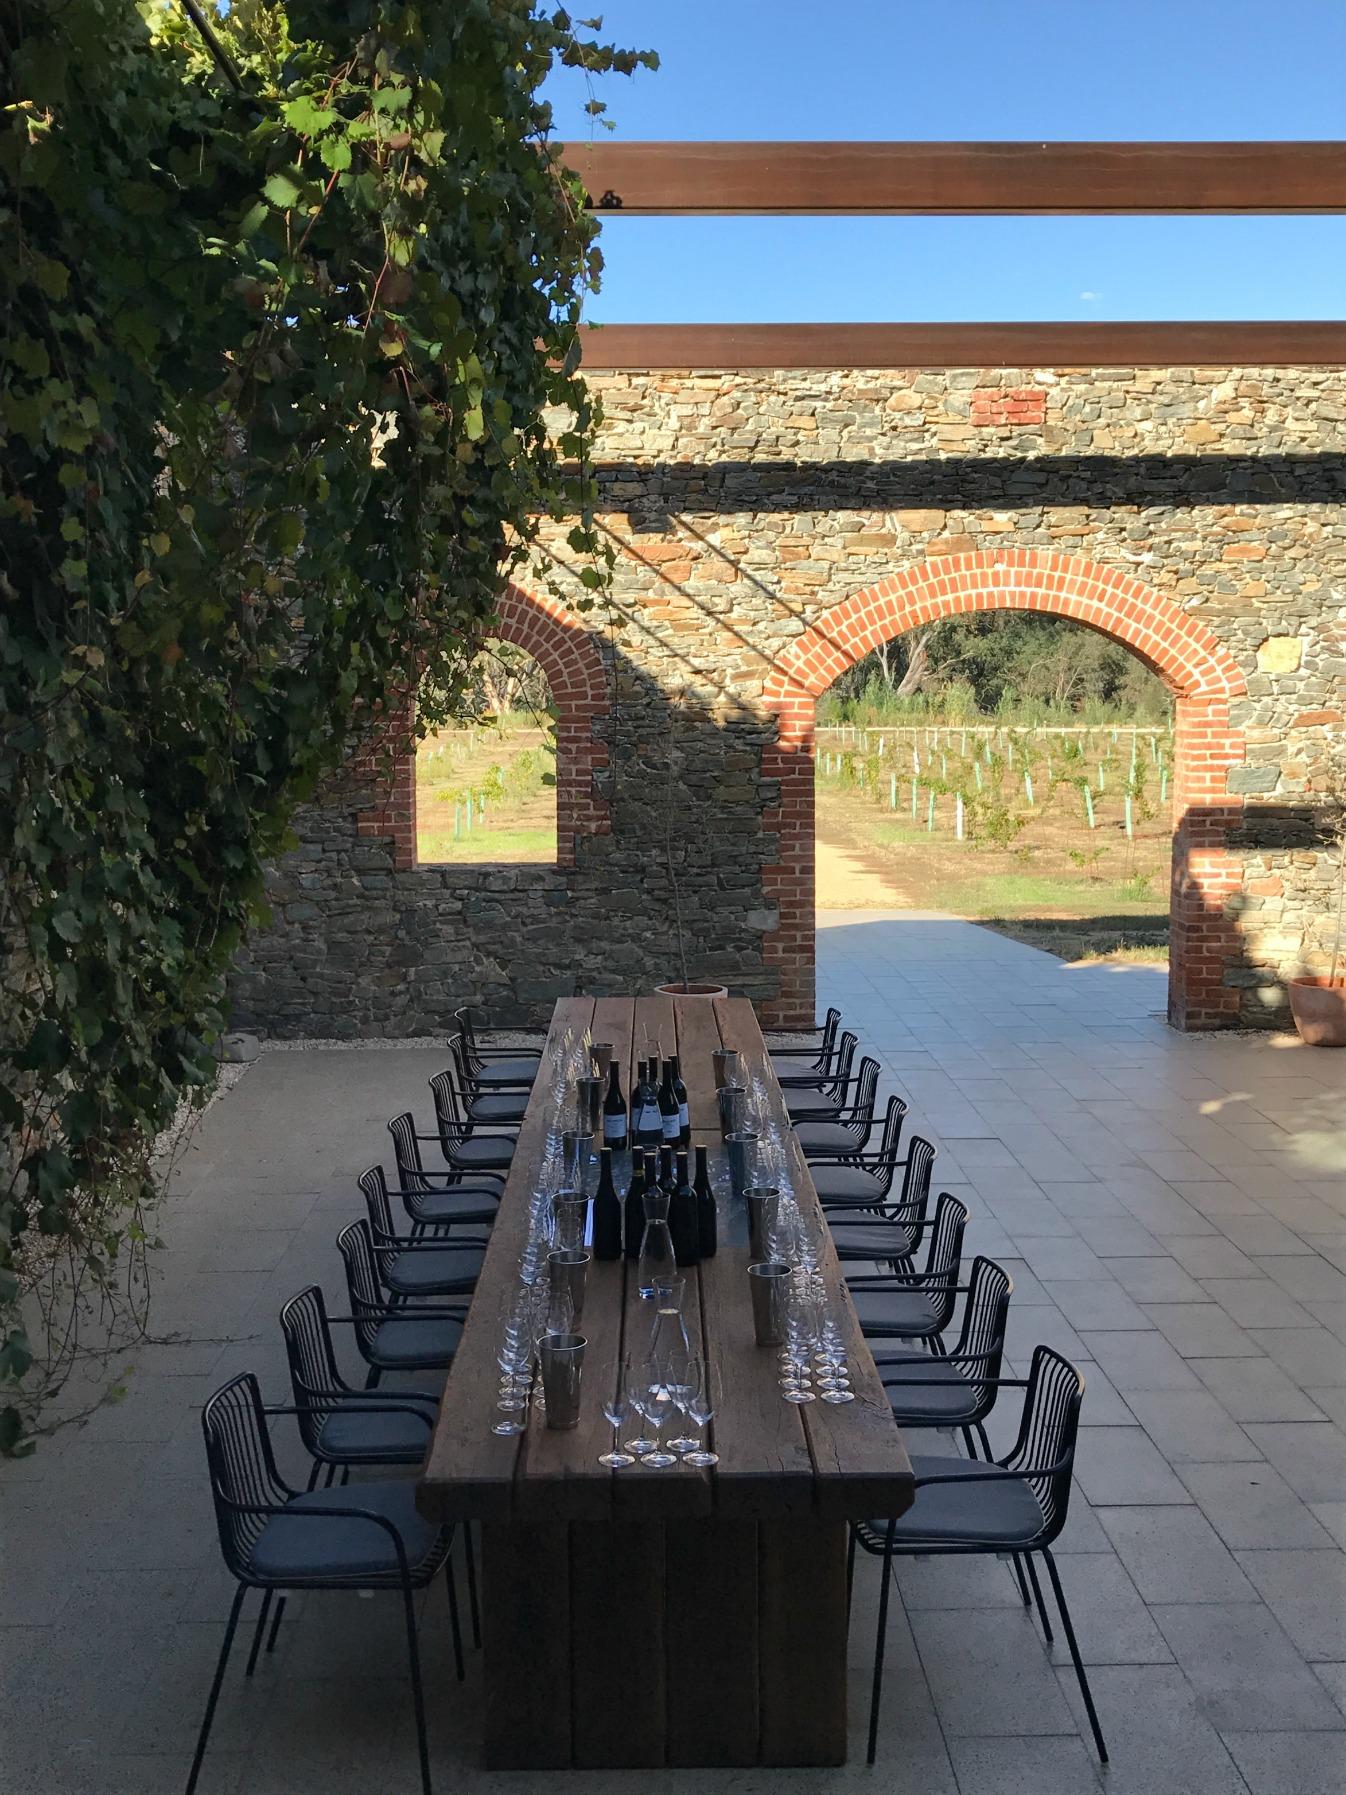 St Hugo Wines luncheon Barossa Valley